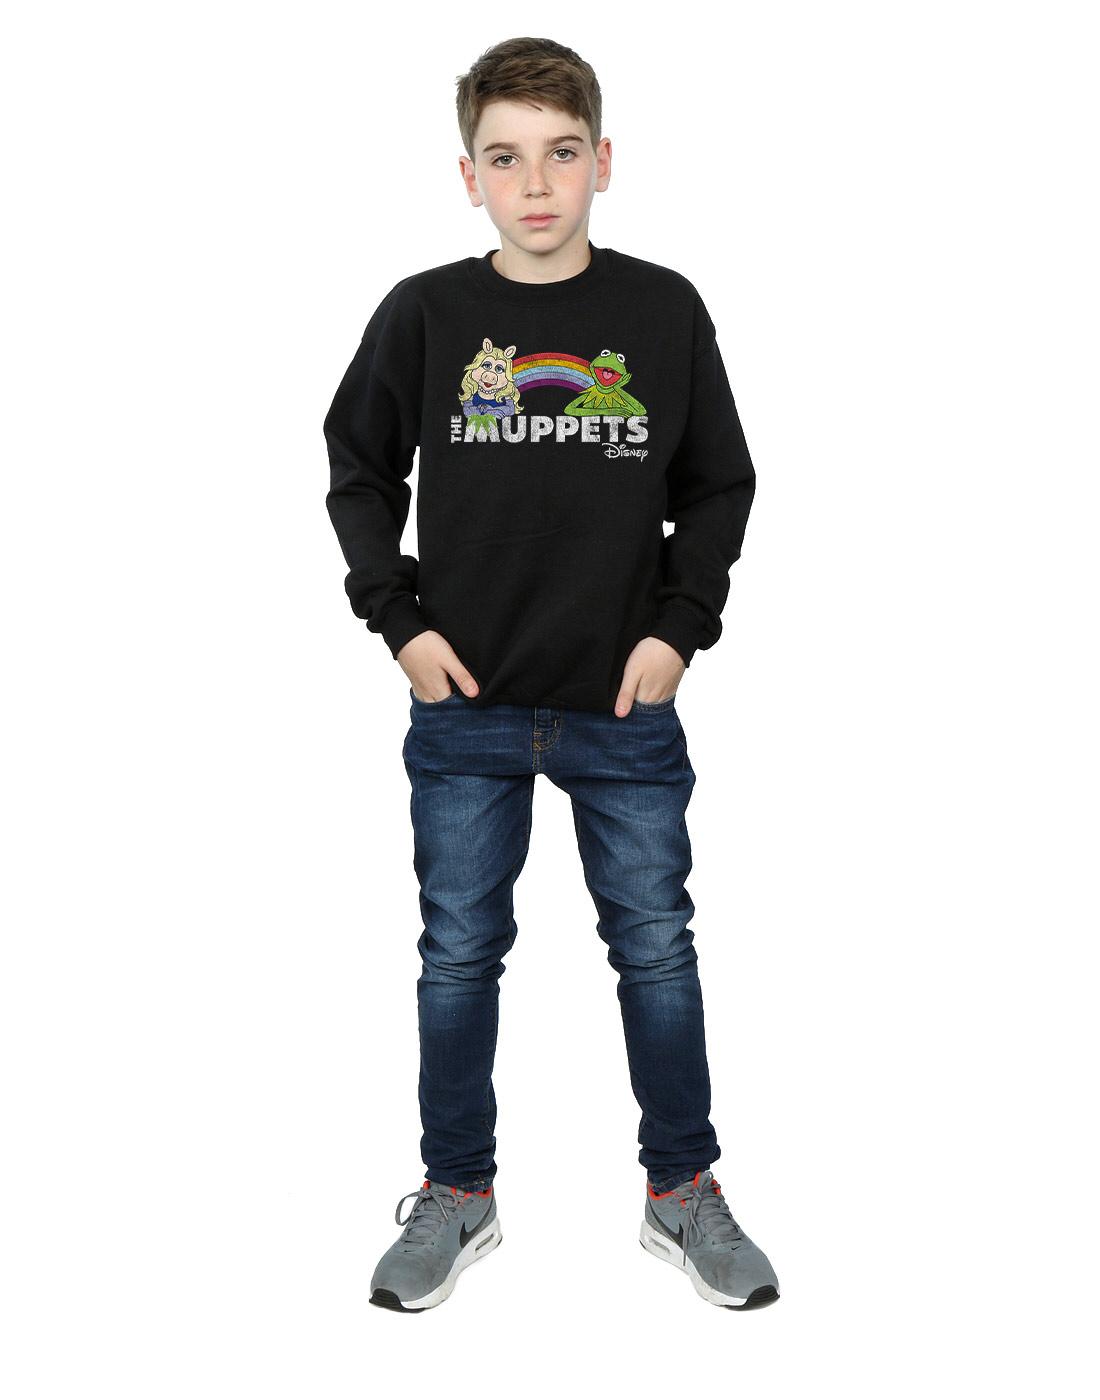 Disney-Garcon-The-Muppets-Rainbow-Sweat-Shirt